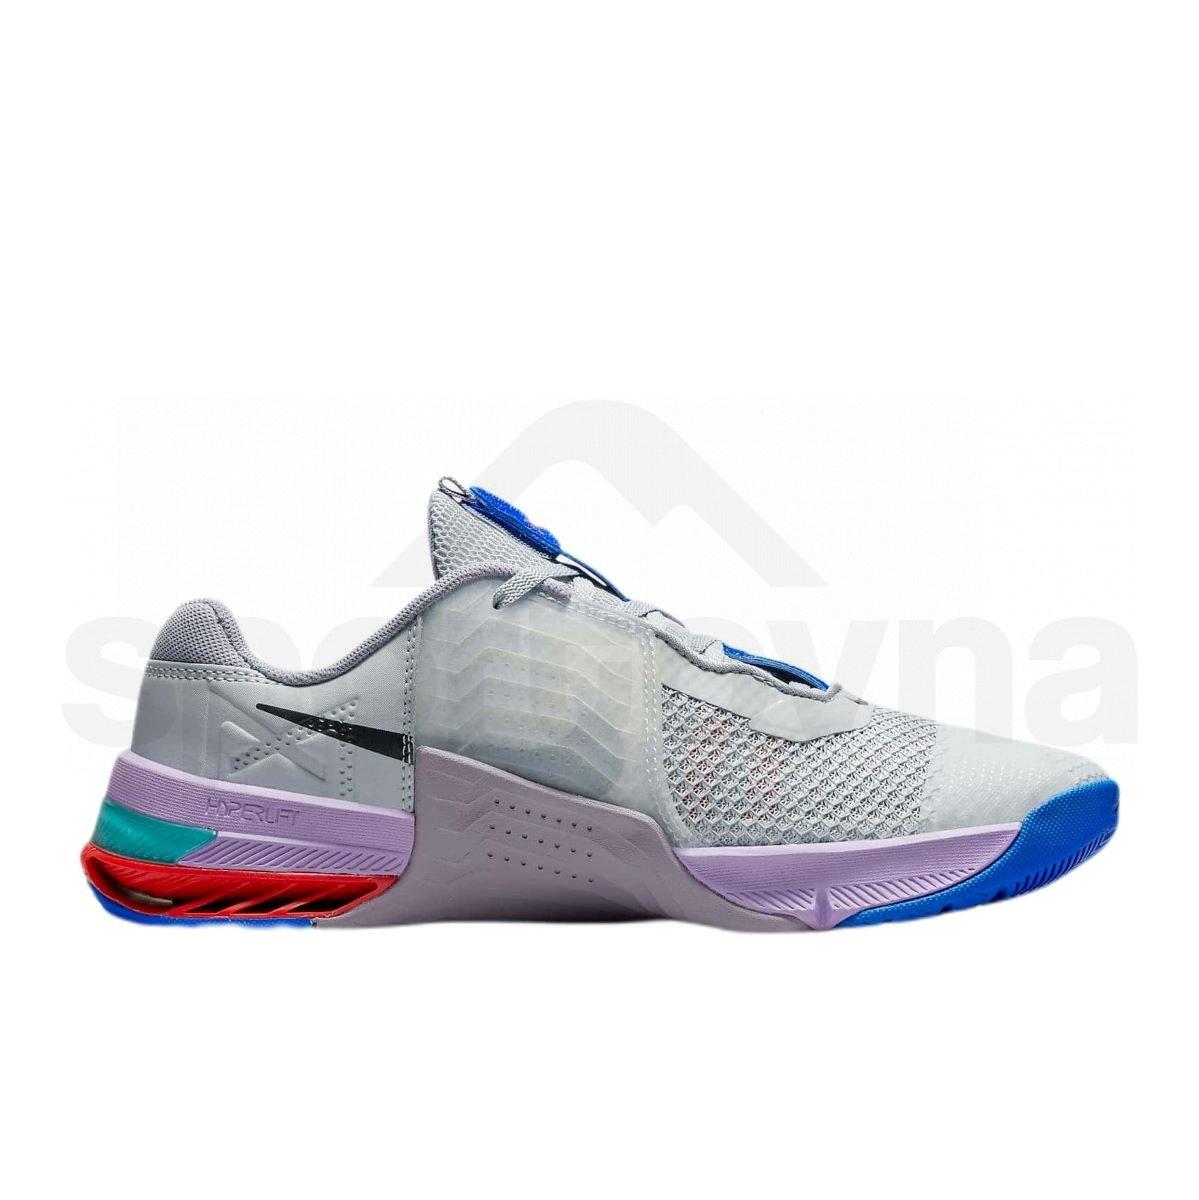 Obuv Nike Metcon 7 M1